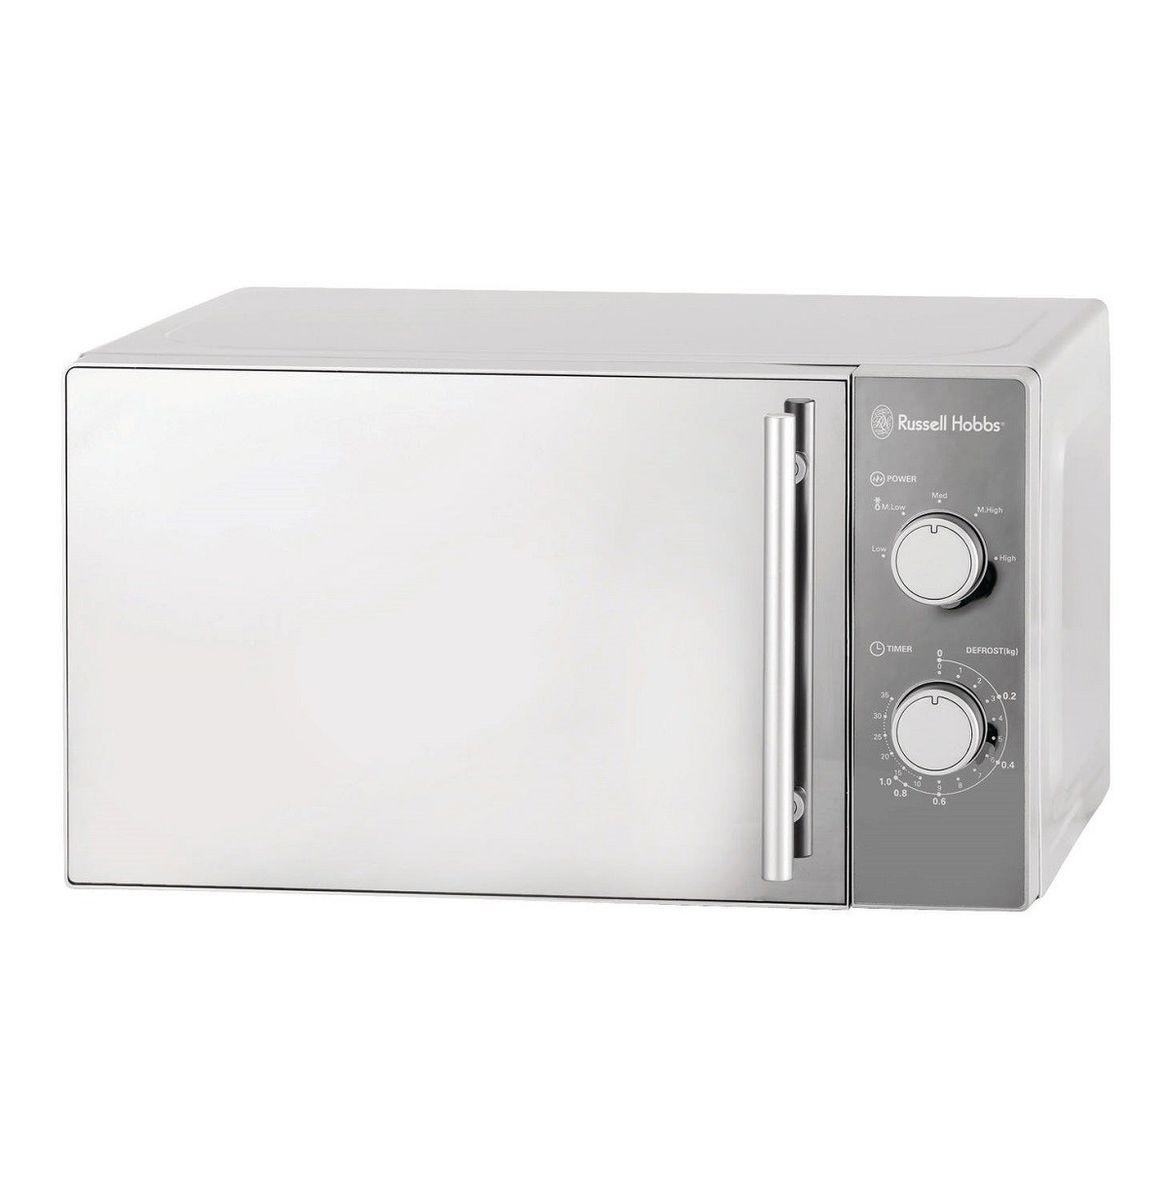 Rus Hobbs 20 Litre Clic Manual Microwave